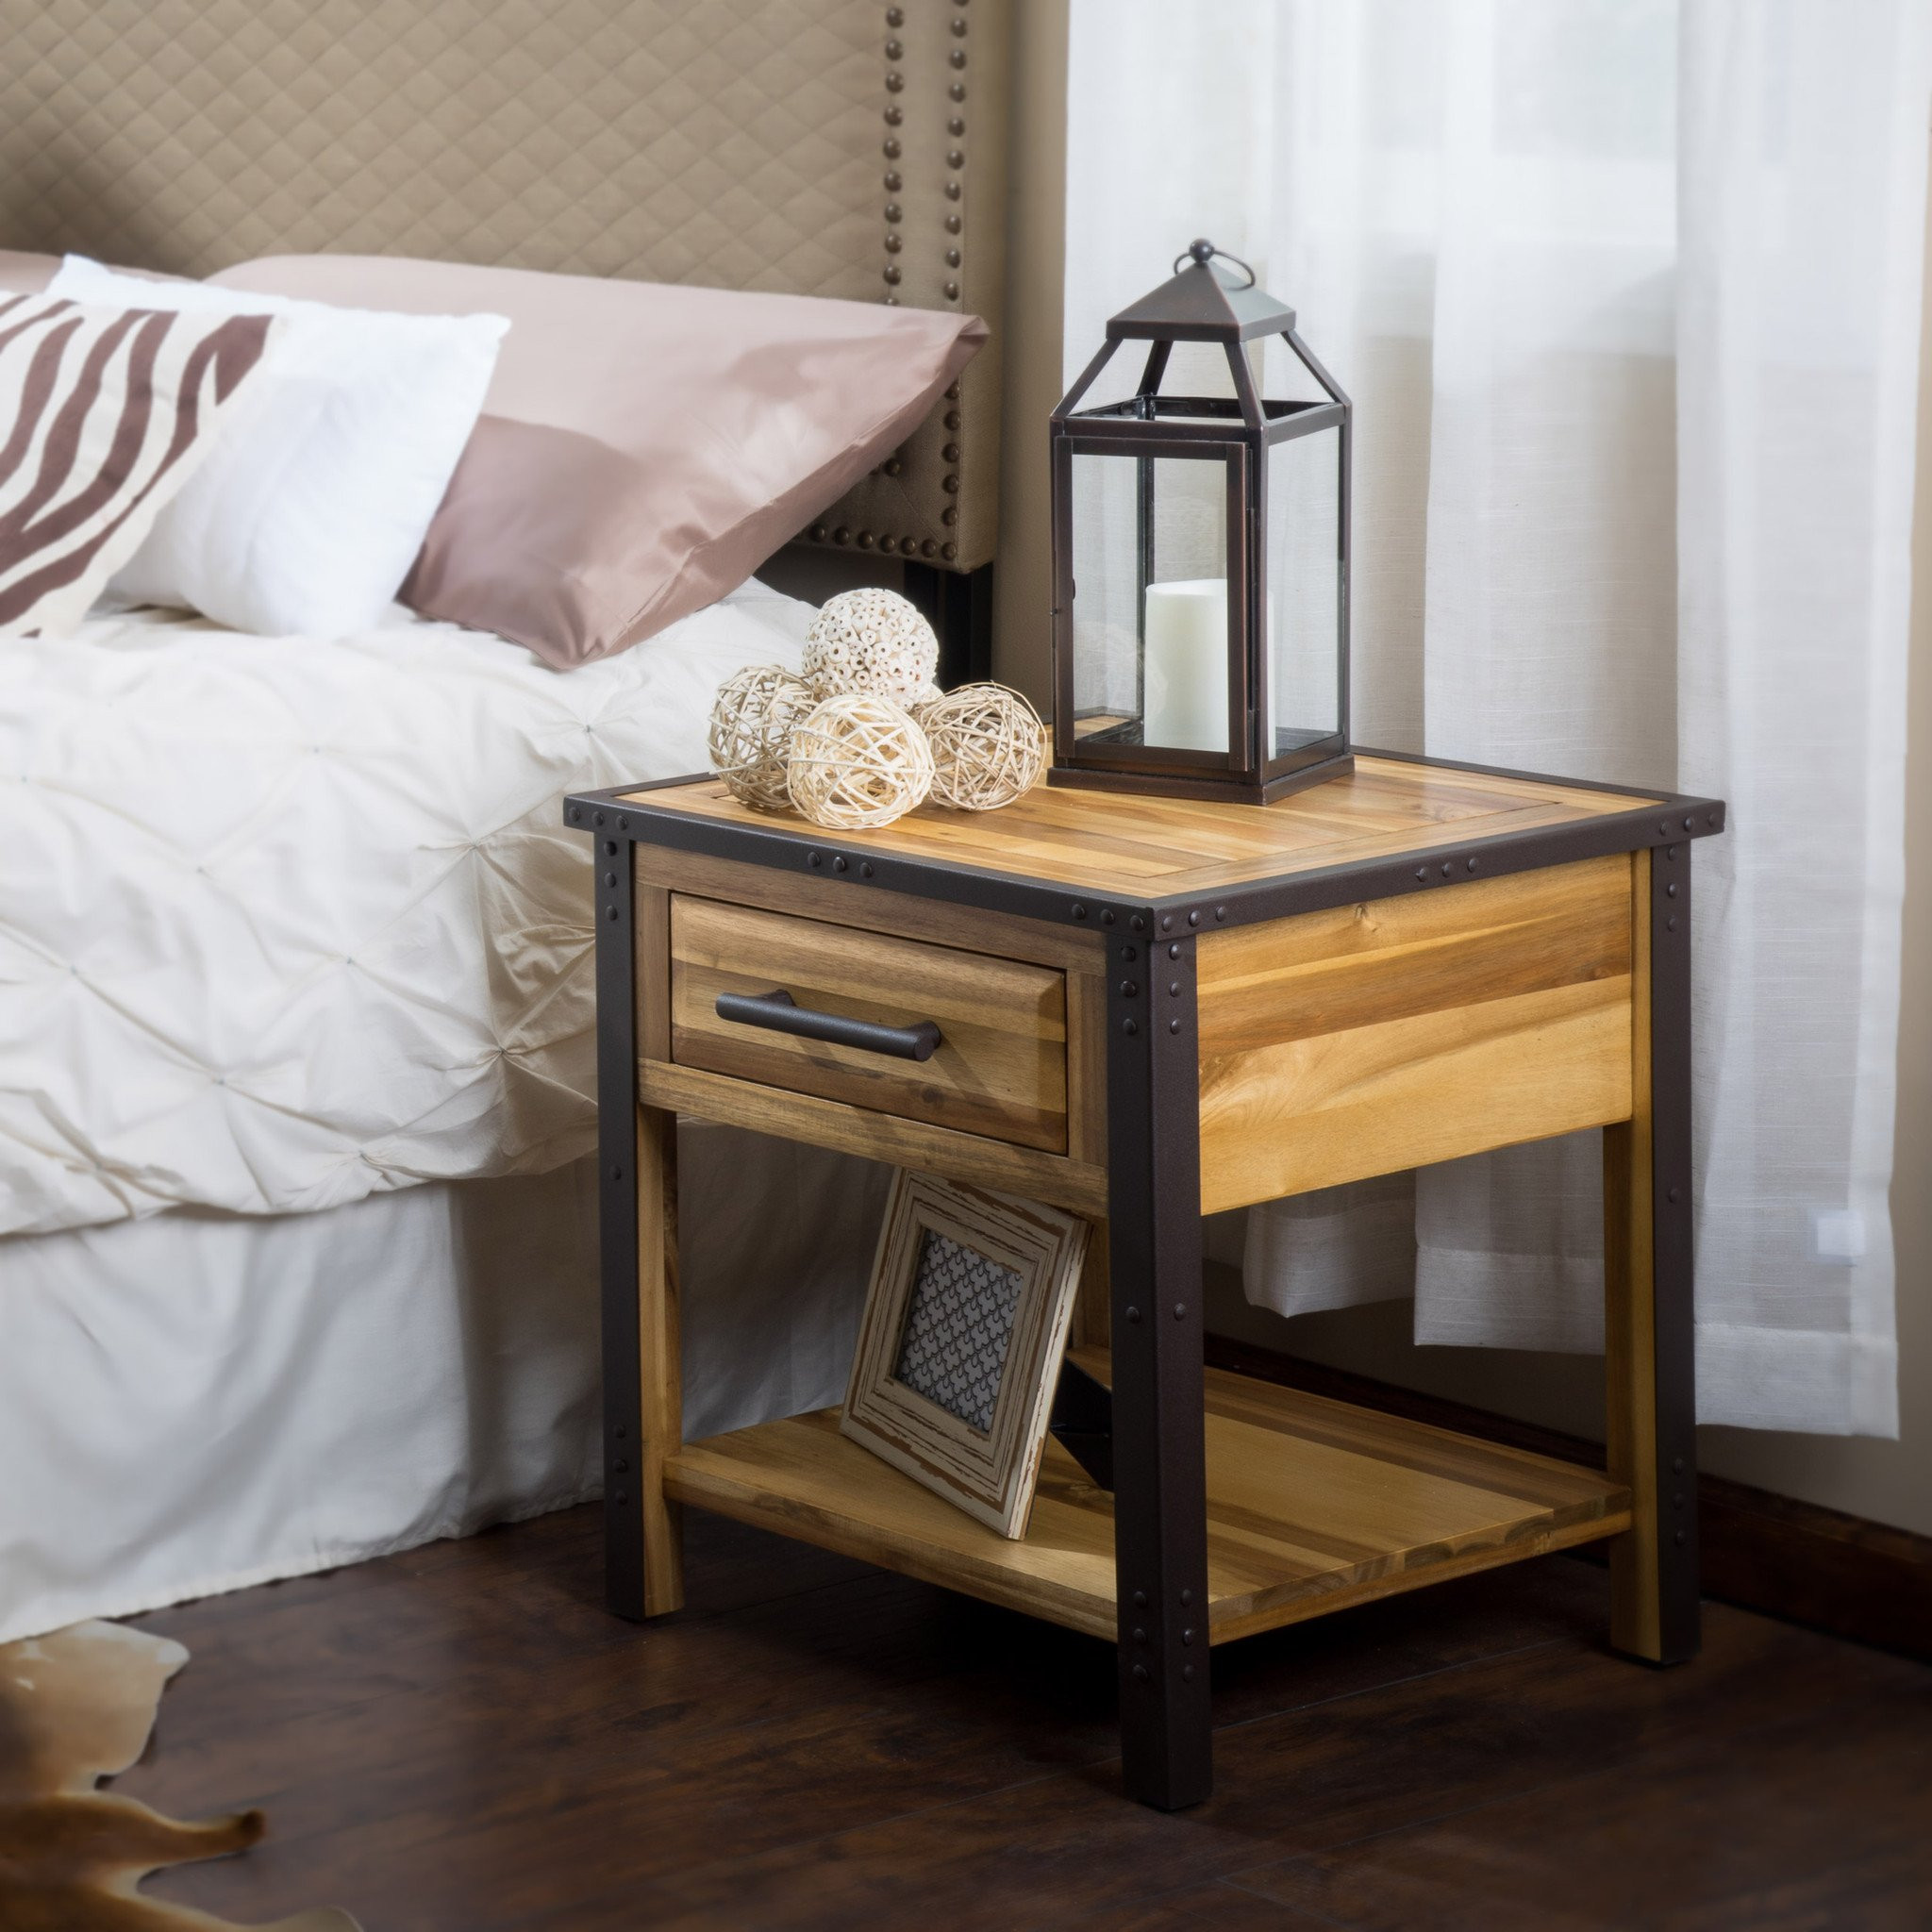 Glendora Industrial Solid Wood Single Drawer Night...